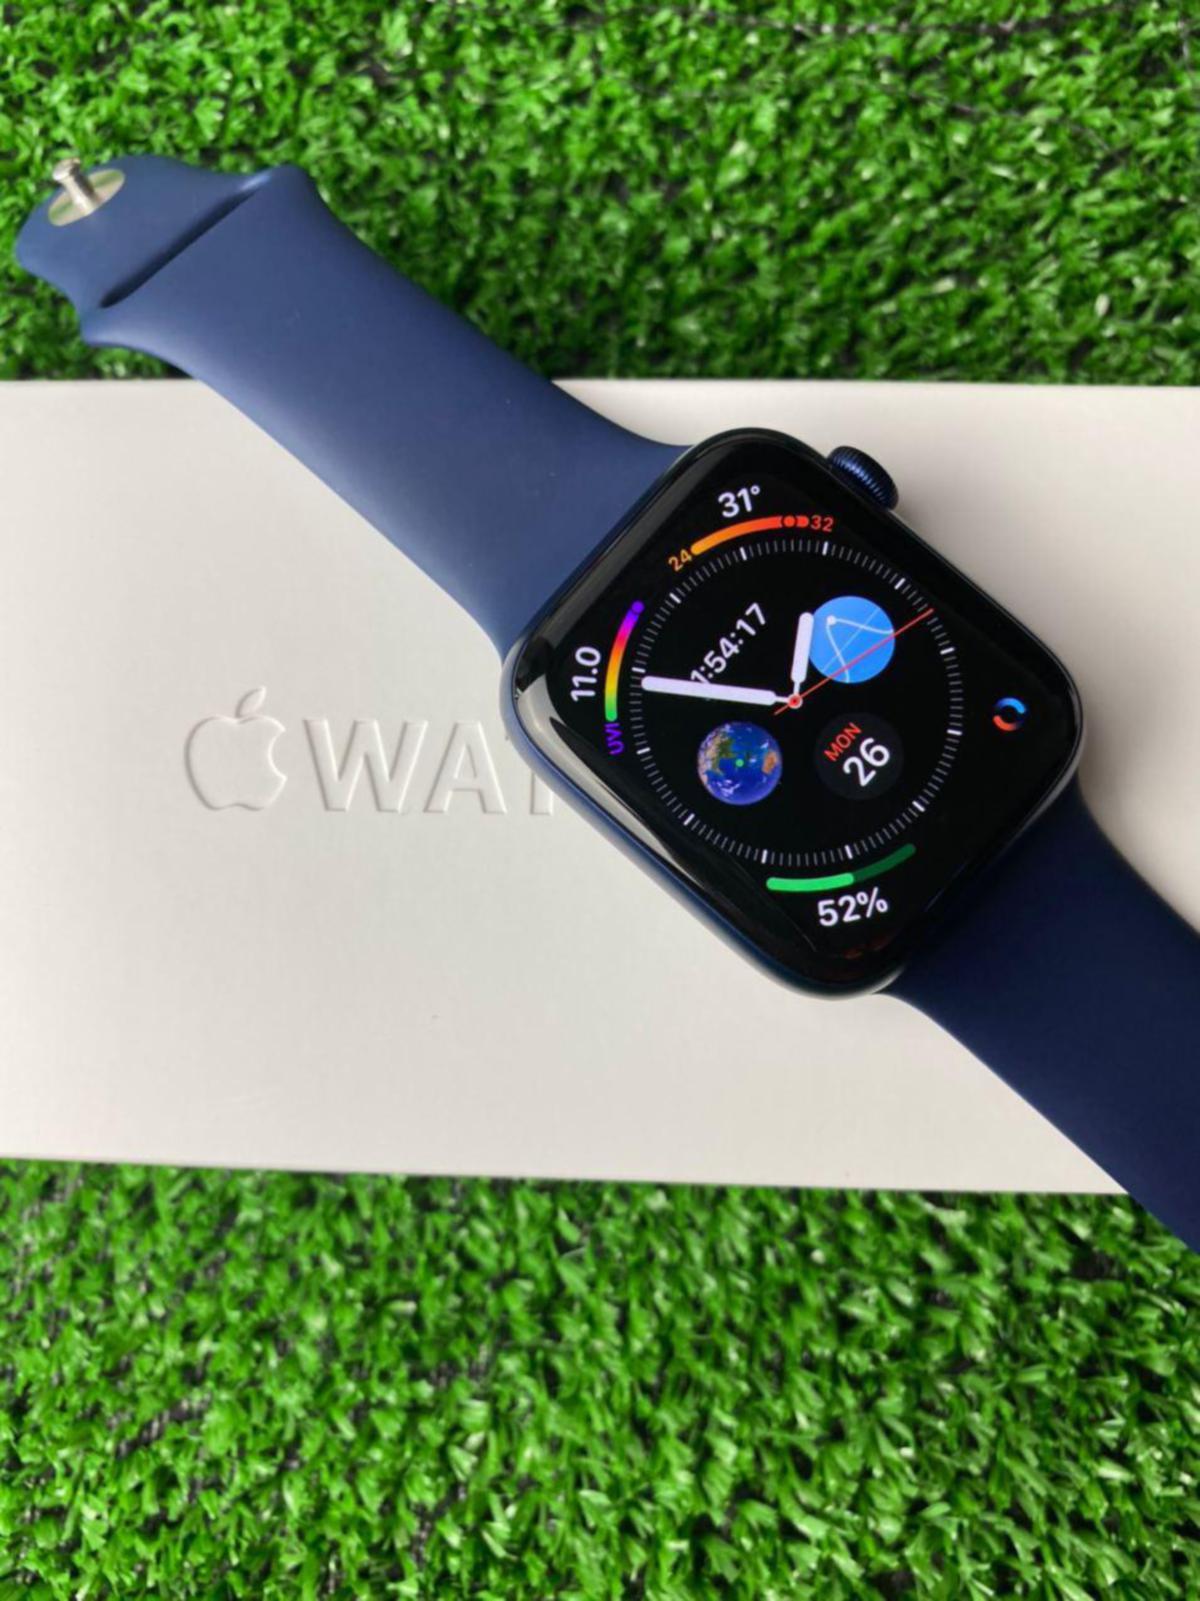 APPLE Watch Series 6 didatangkan dengan kefungsian sensor baharu untuk menyemak kadar oksigen dalam darah termasuk beberapa ciri khusus kepada pengguna.